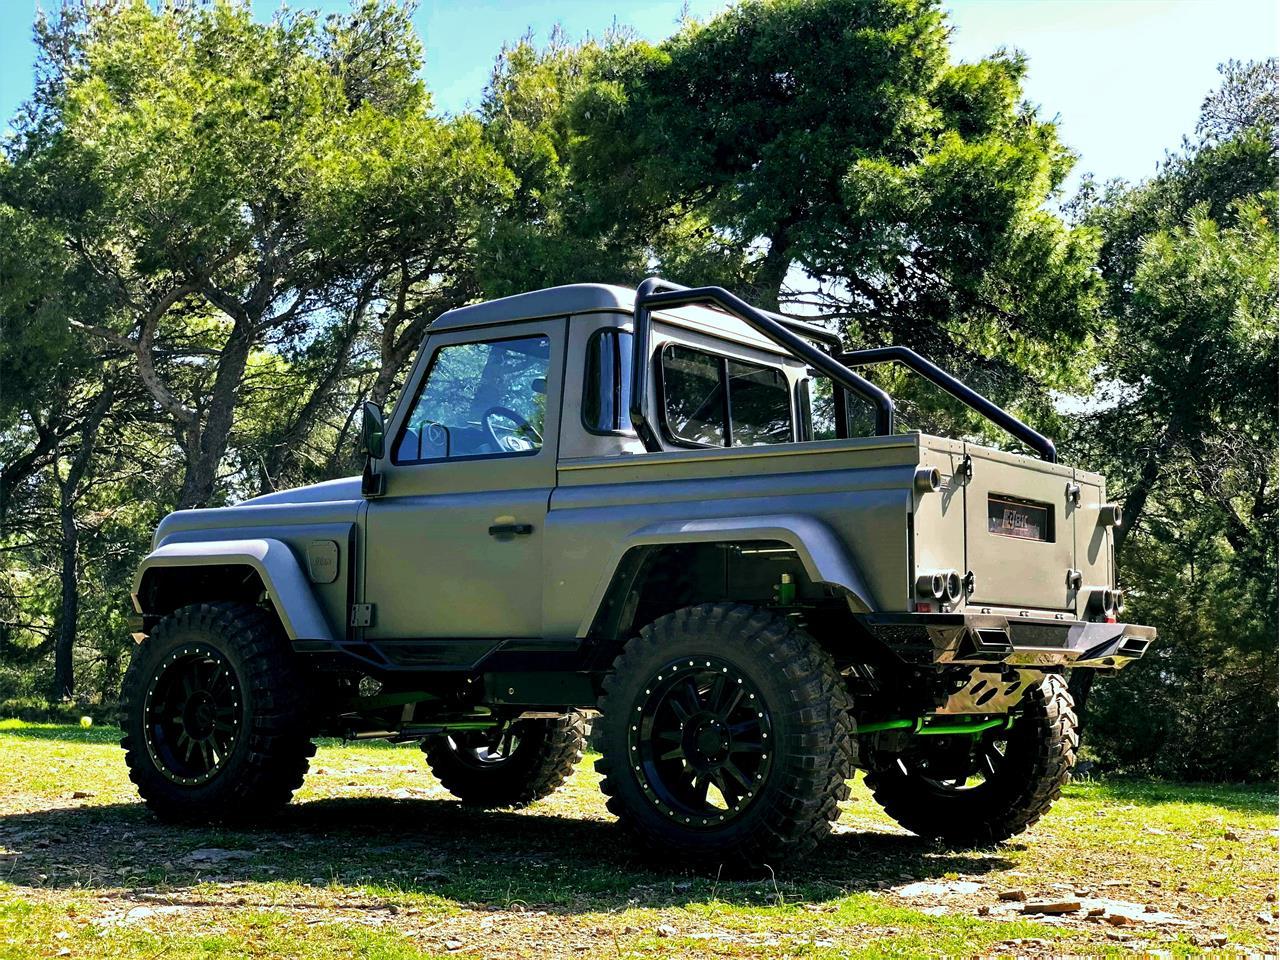 1988 Land Rover Defender (CC-1257175) for sale in Athens, Attica